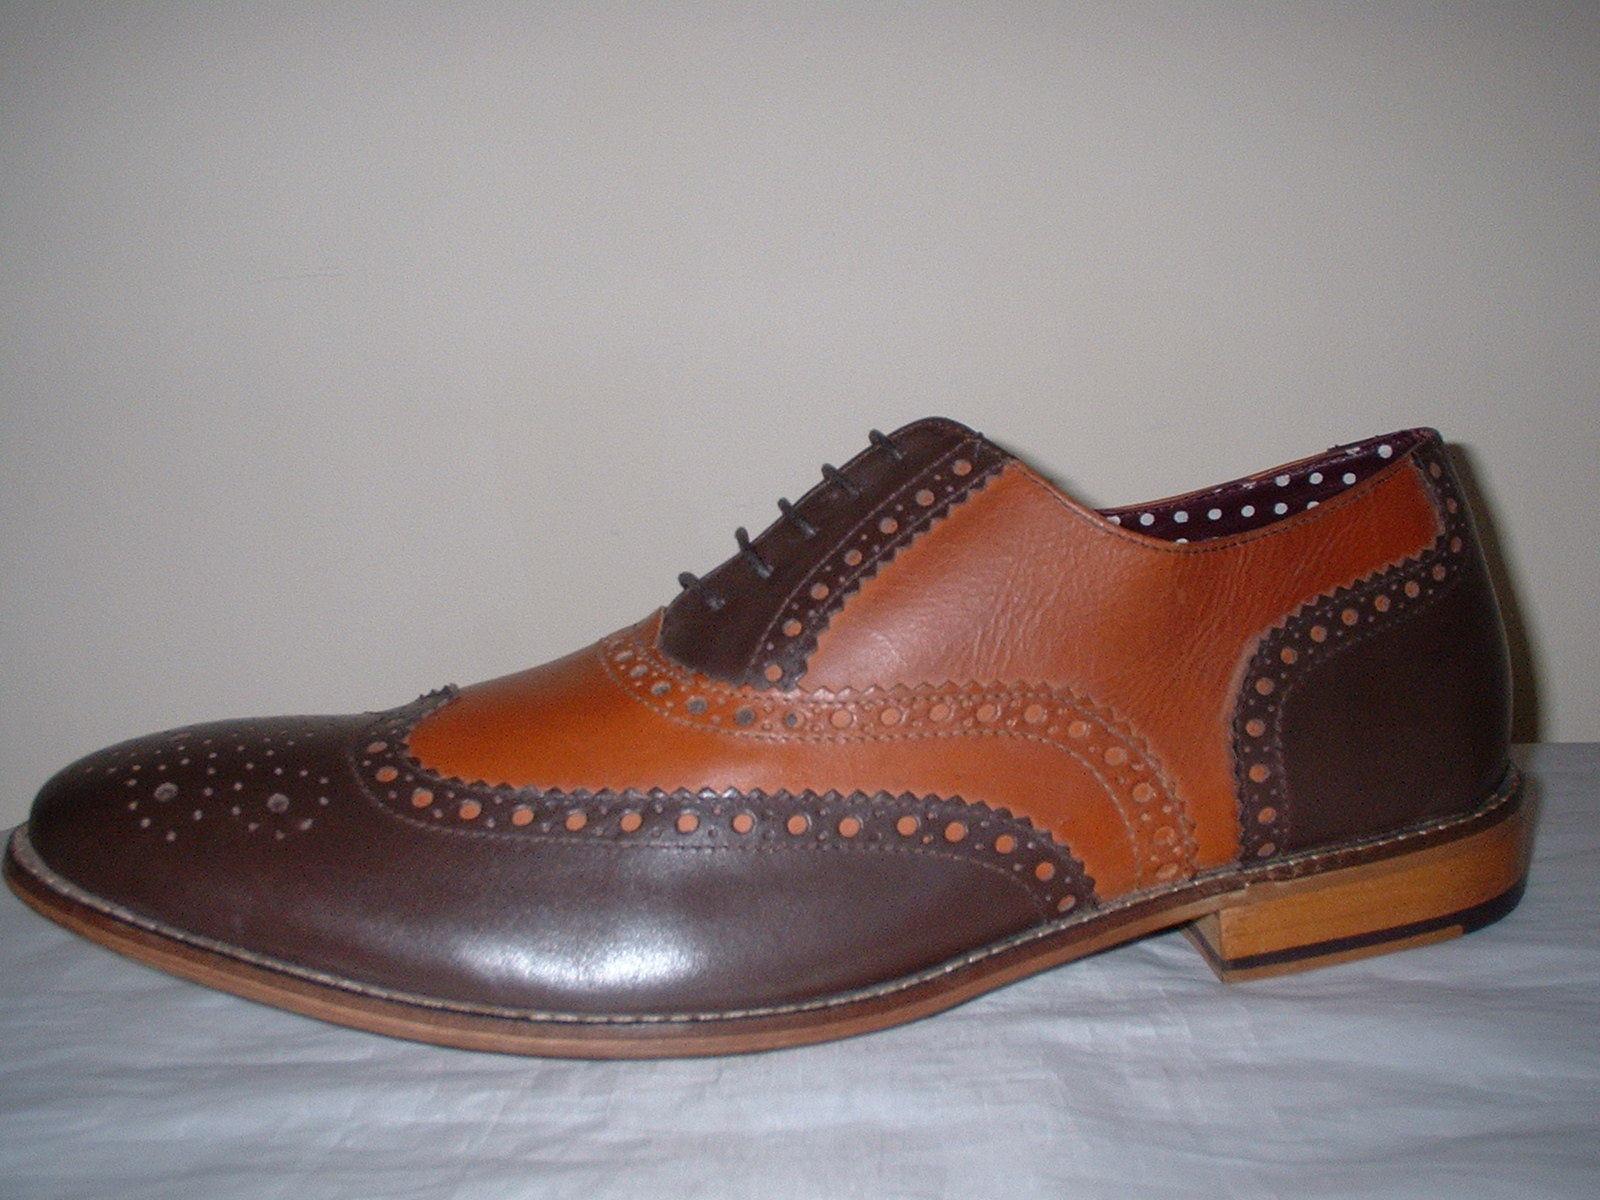 LONDON LONDON LONDON BROGUES  Herren BROWN /TAN GENUINE LEATHER BROGUE LACE UP OXFORD Schuhe 13/47 1bebbc